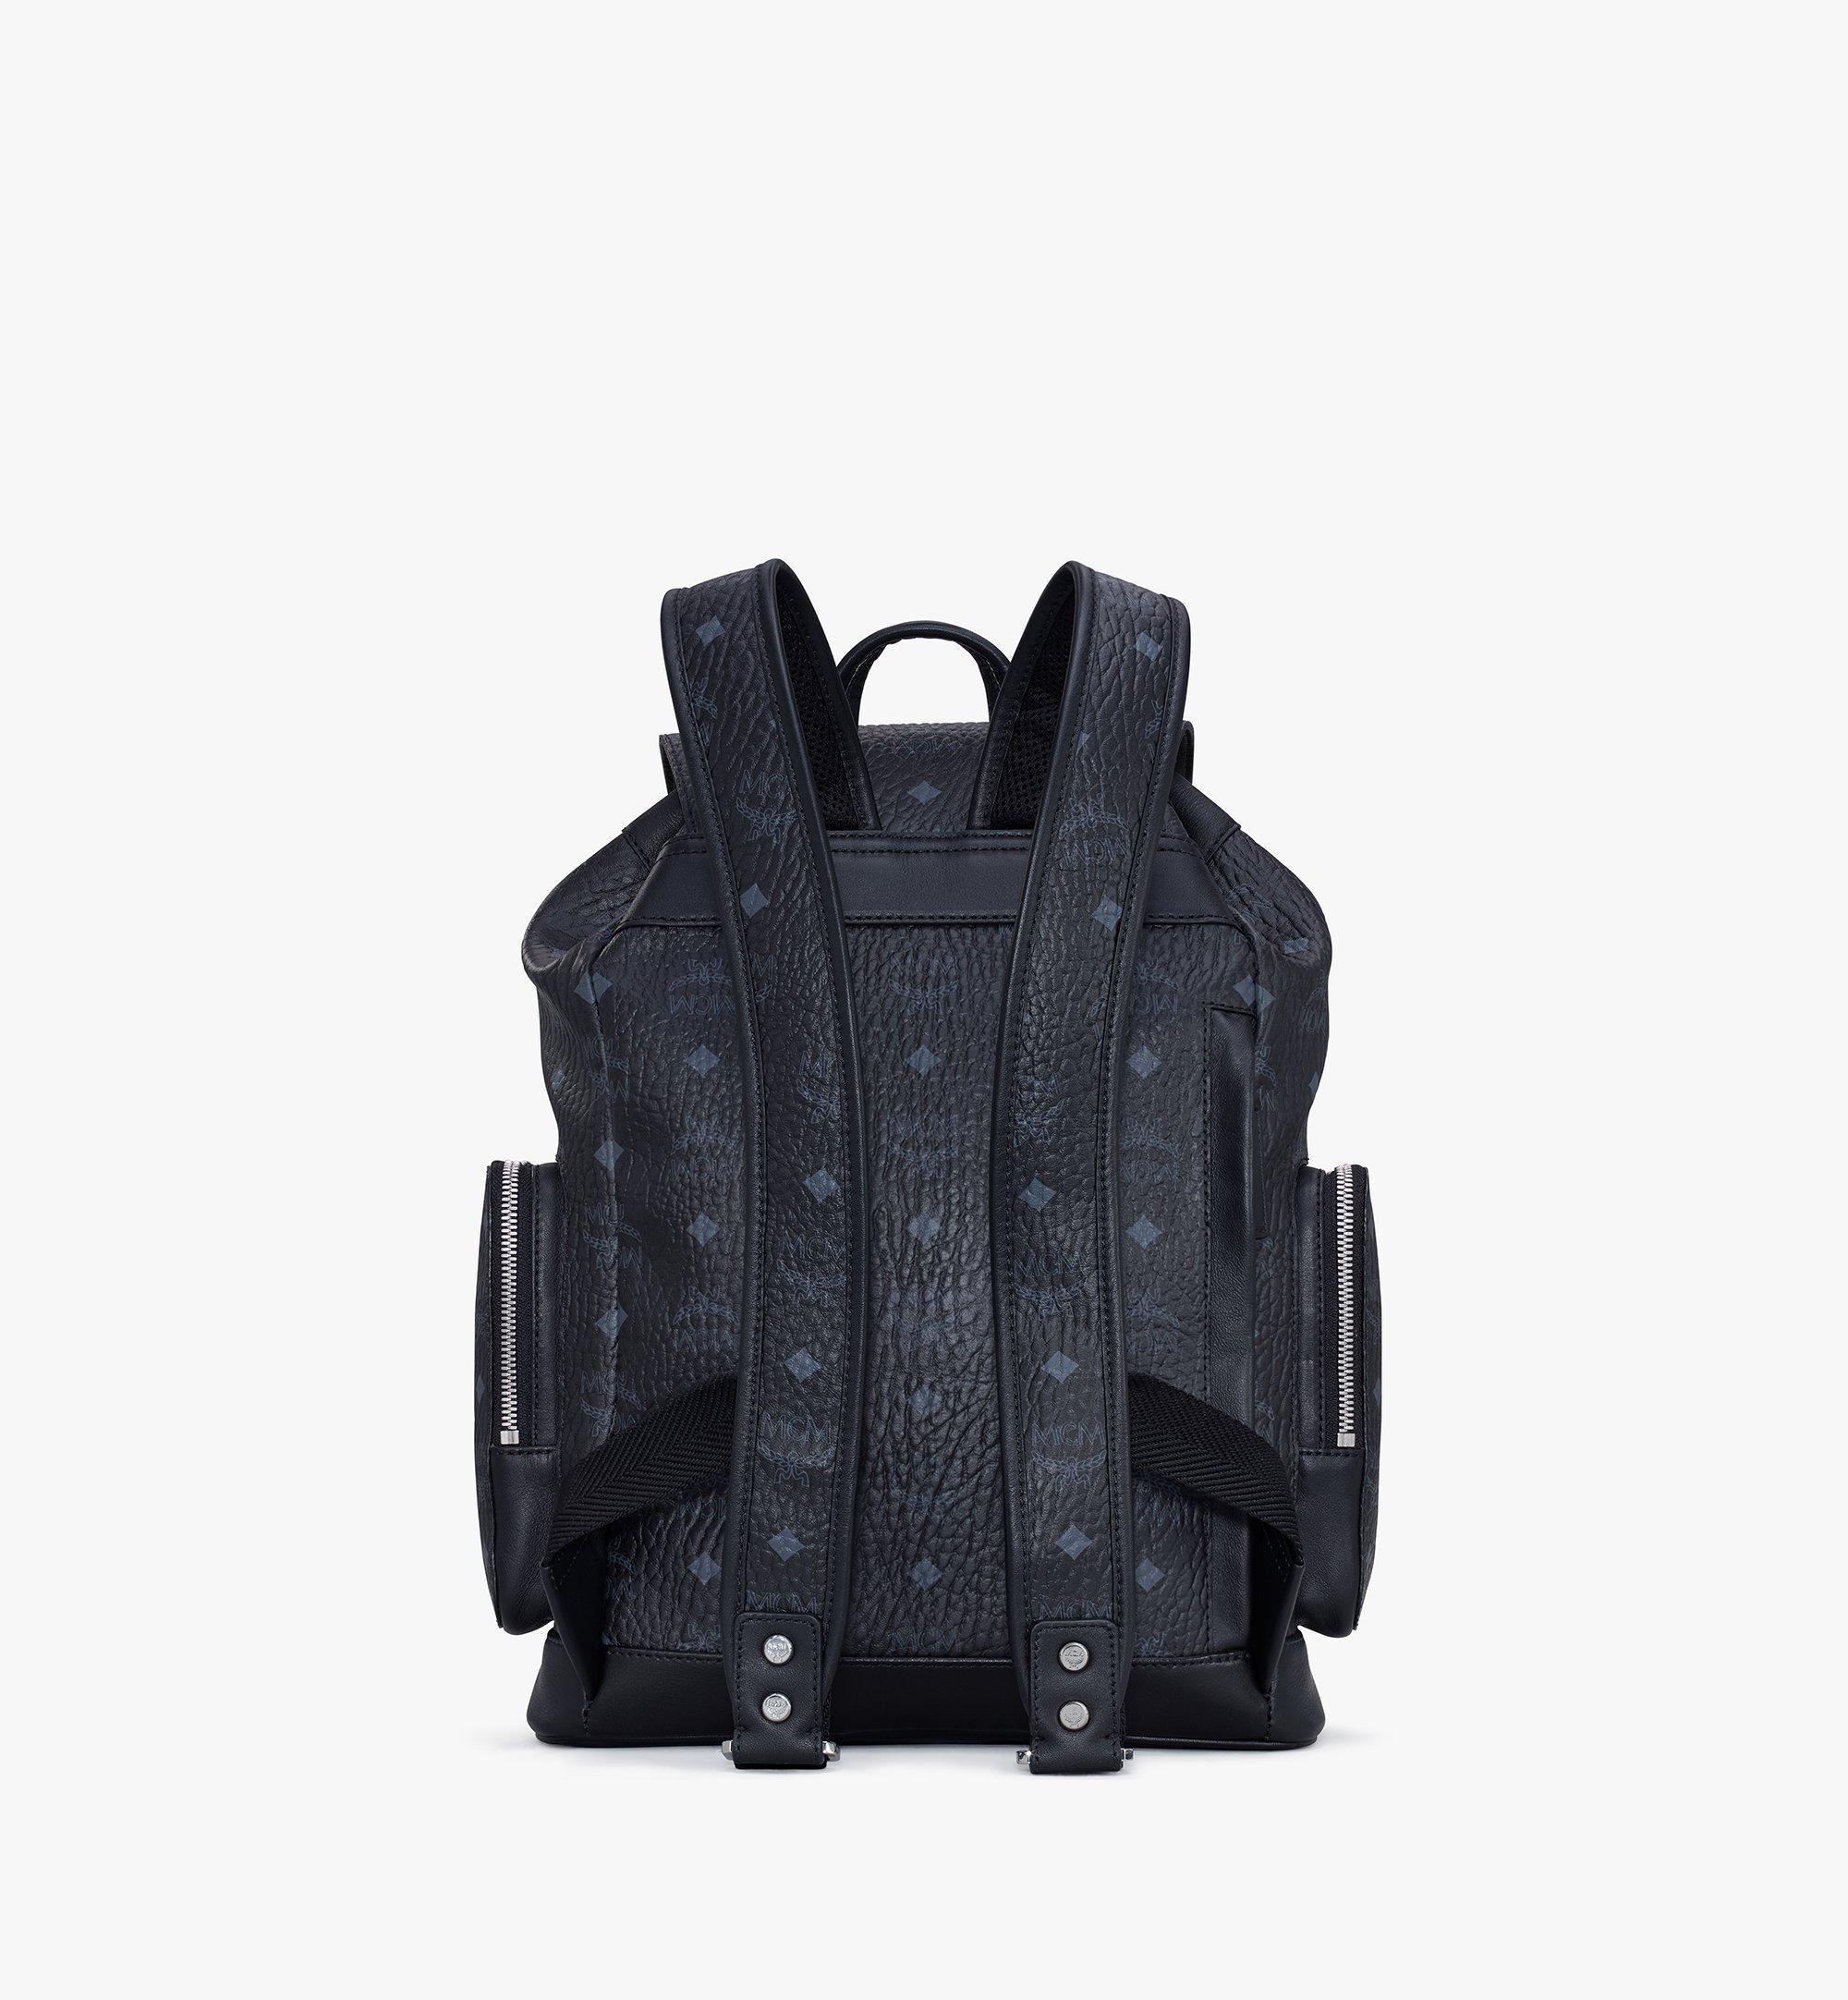 MCM Brandenburg Backpack in Visetos Black MMKASBG05BK001 Alternate View 2